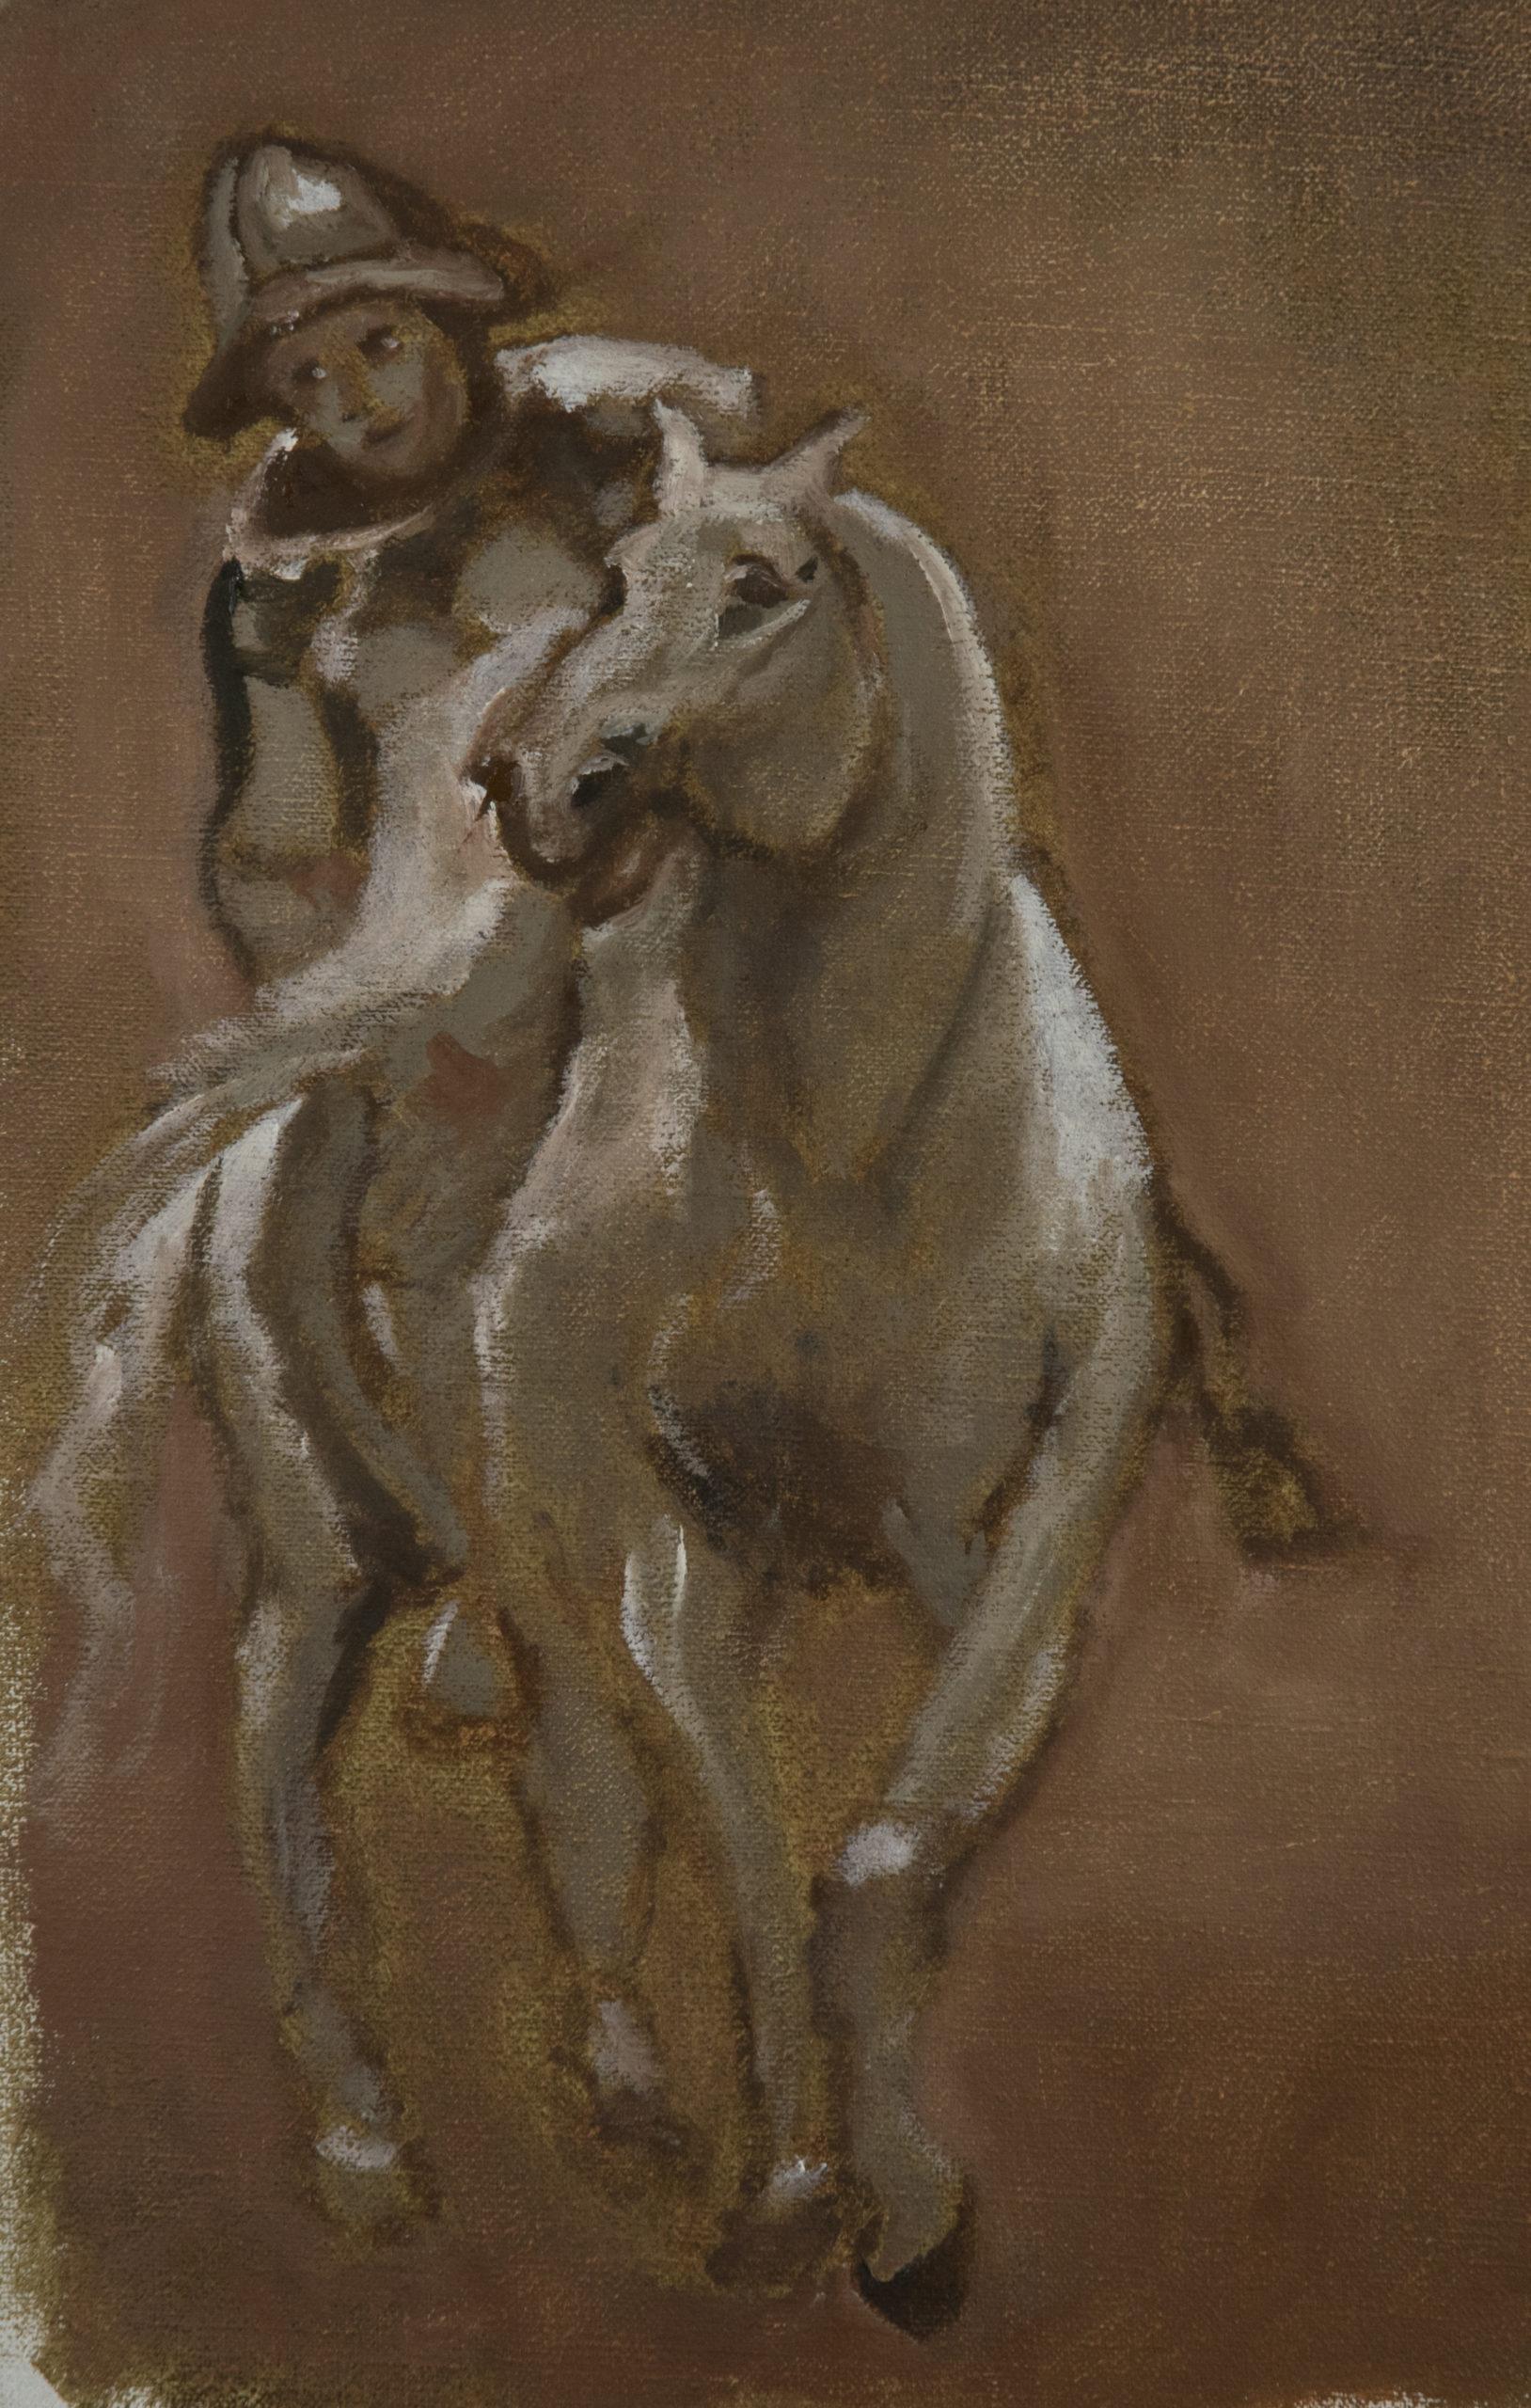 A soldier on horseback after Anthony van Dyck